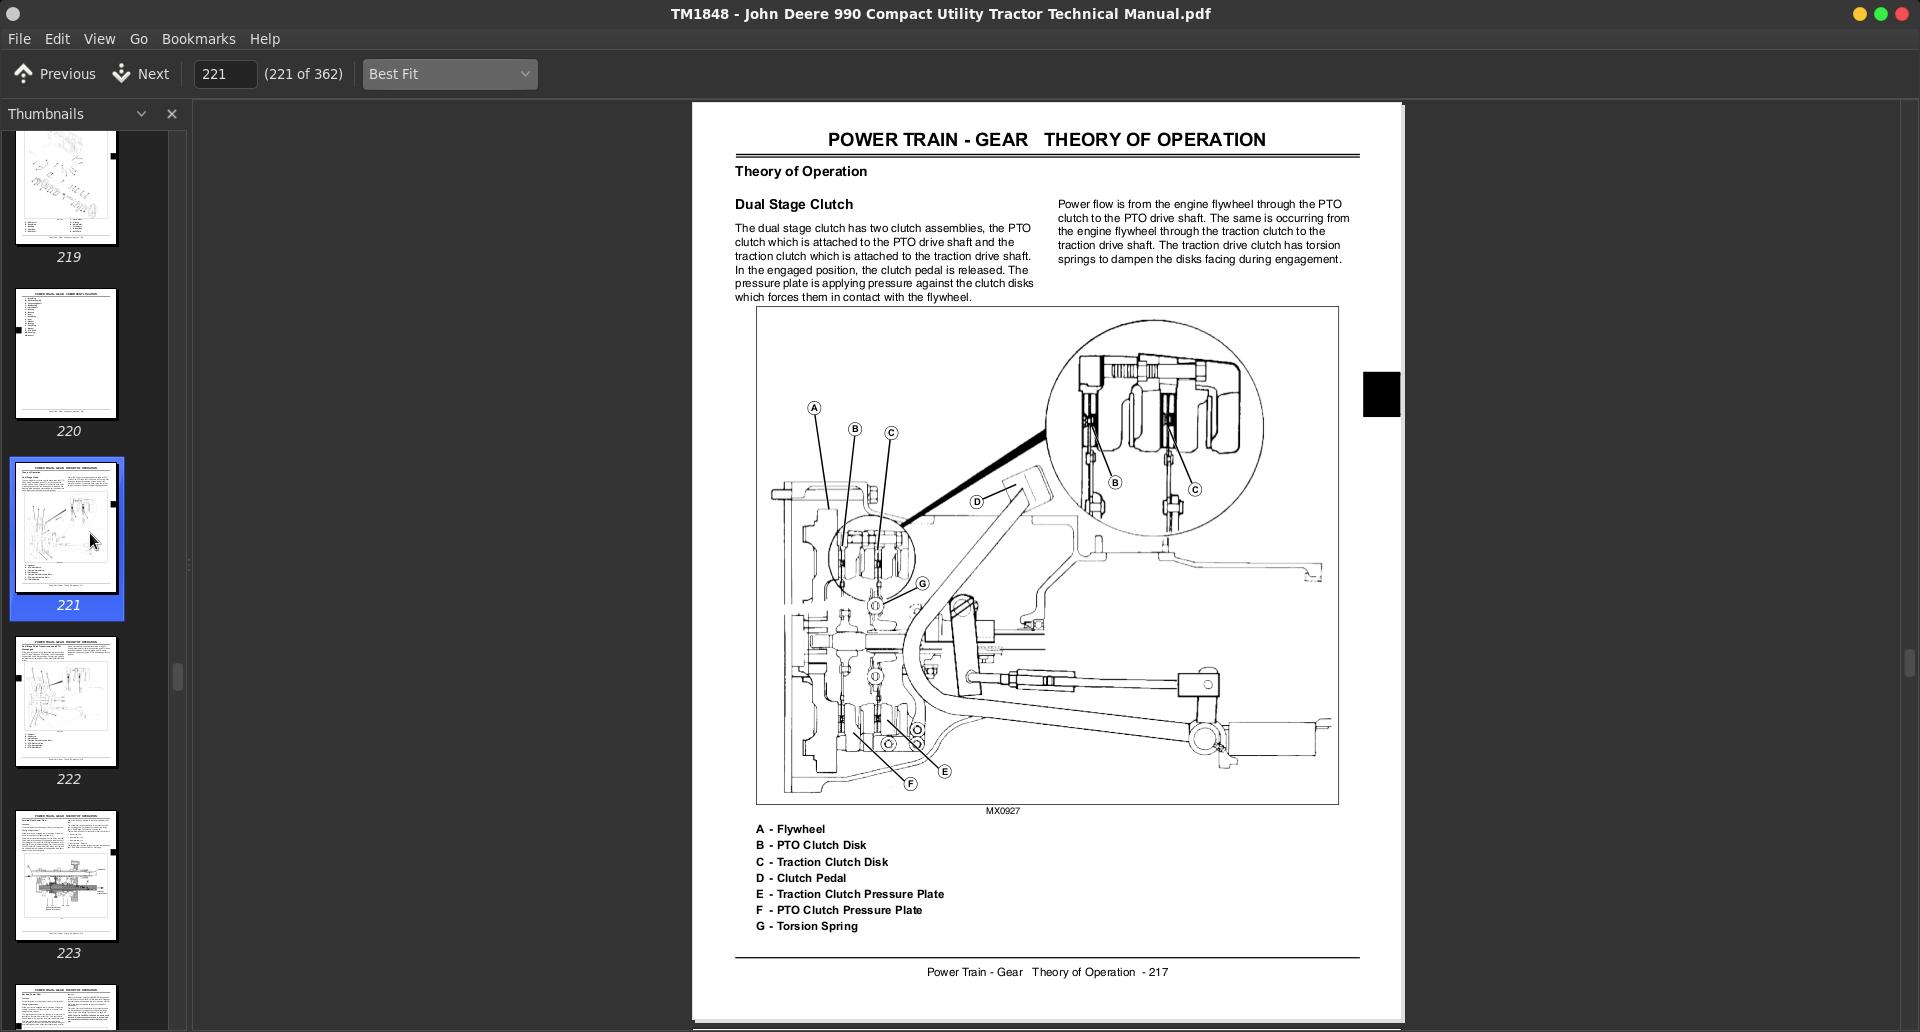 John Deere 990 Compact Utility Tractor Service Technical Manual  Tm1848